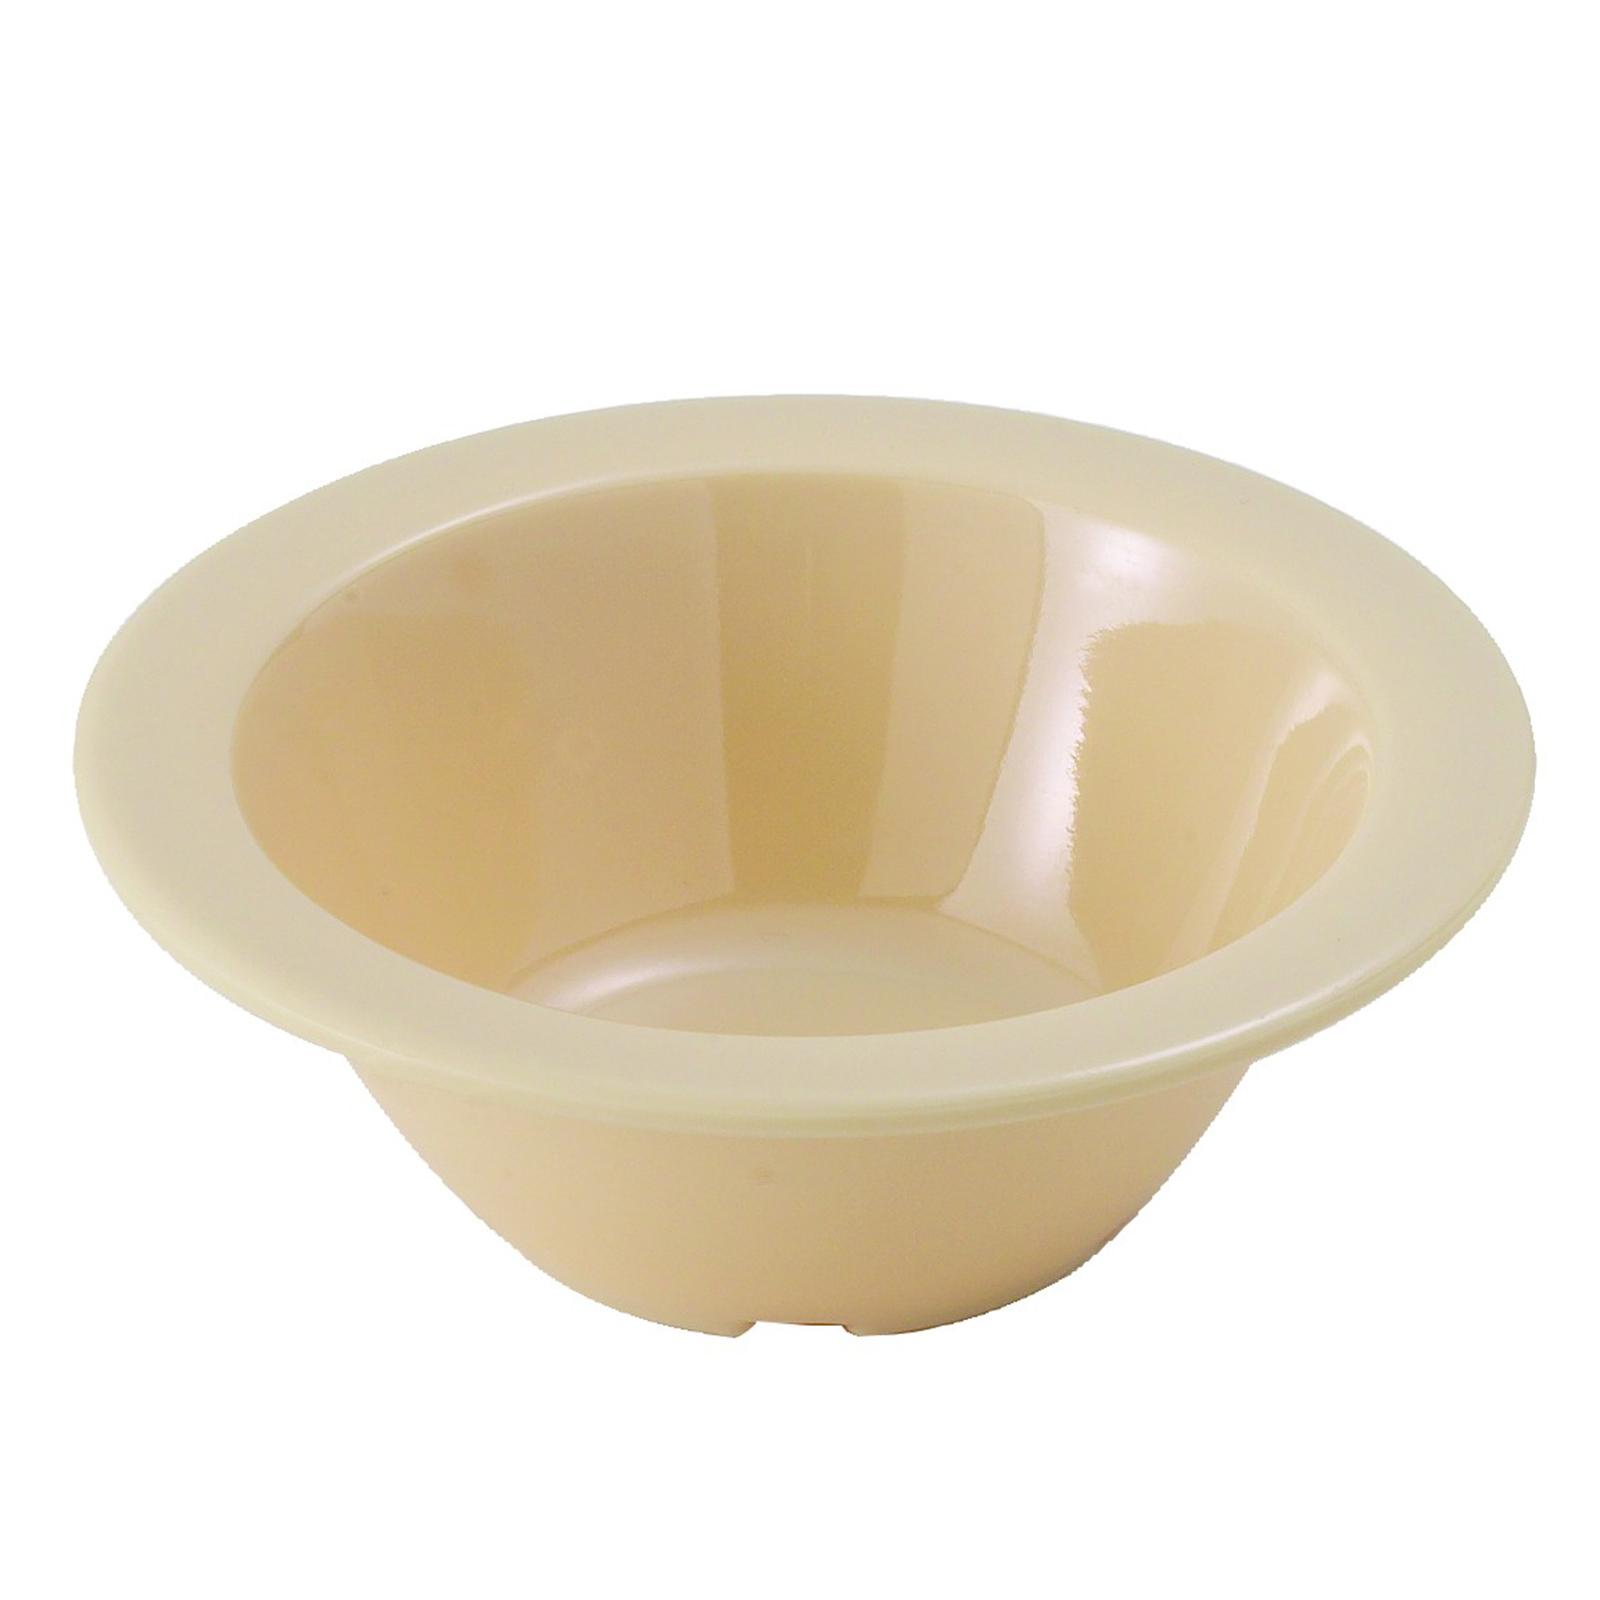 Winco MMB-4 fruit dish, plastic